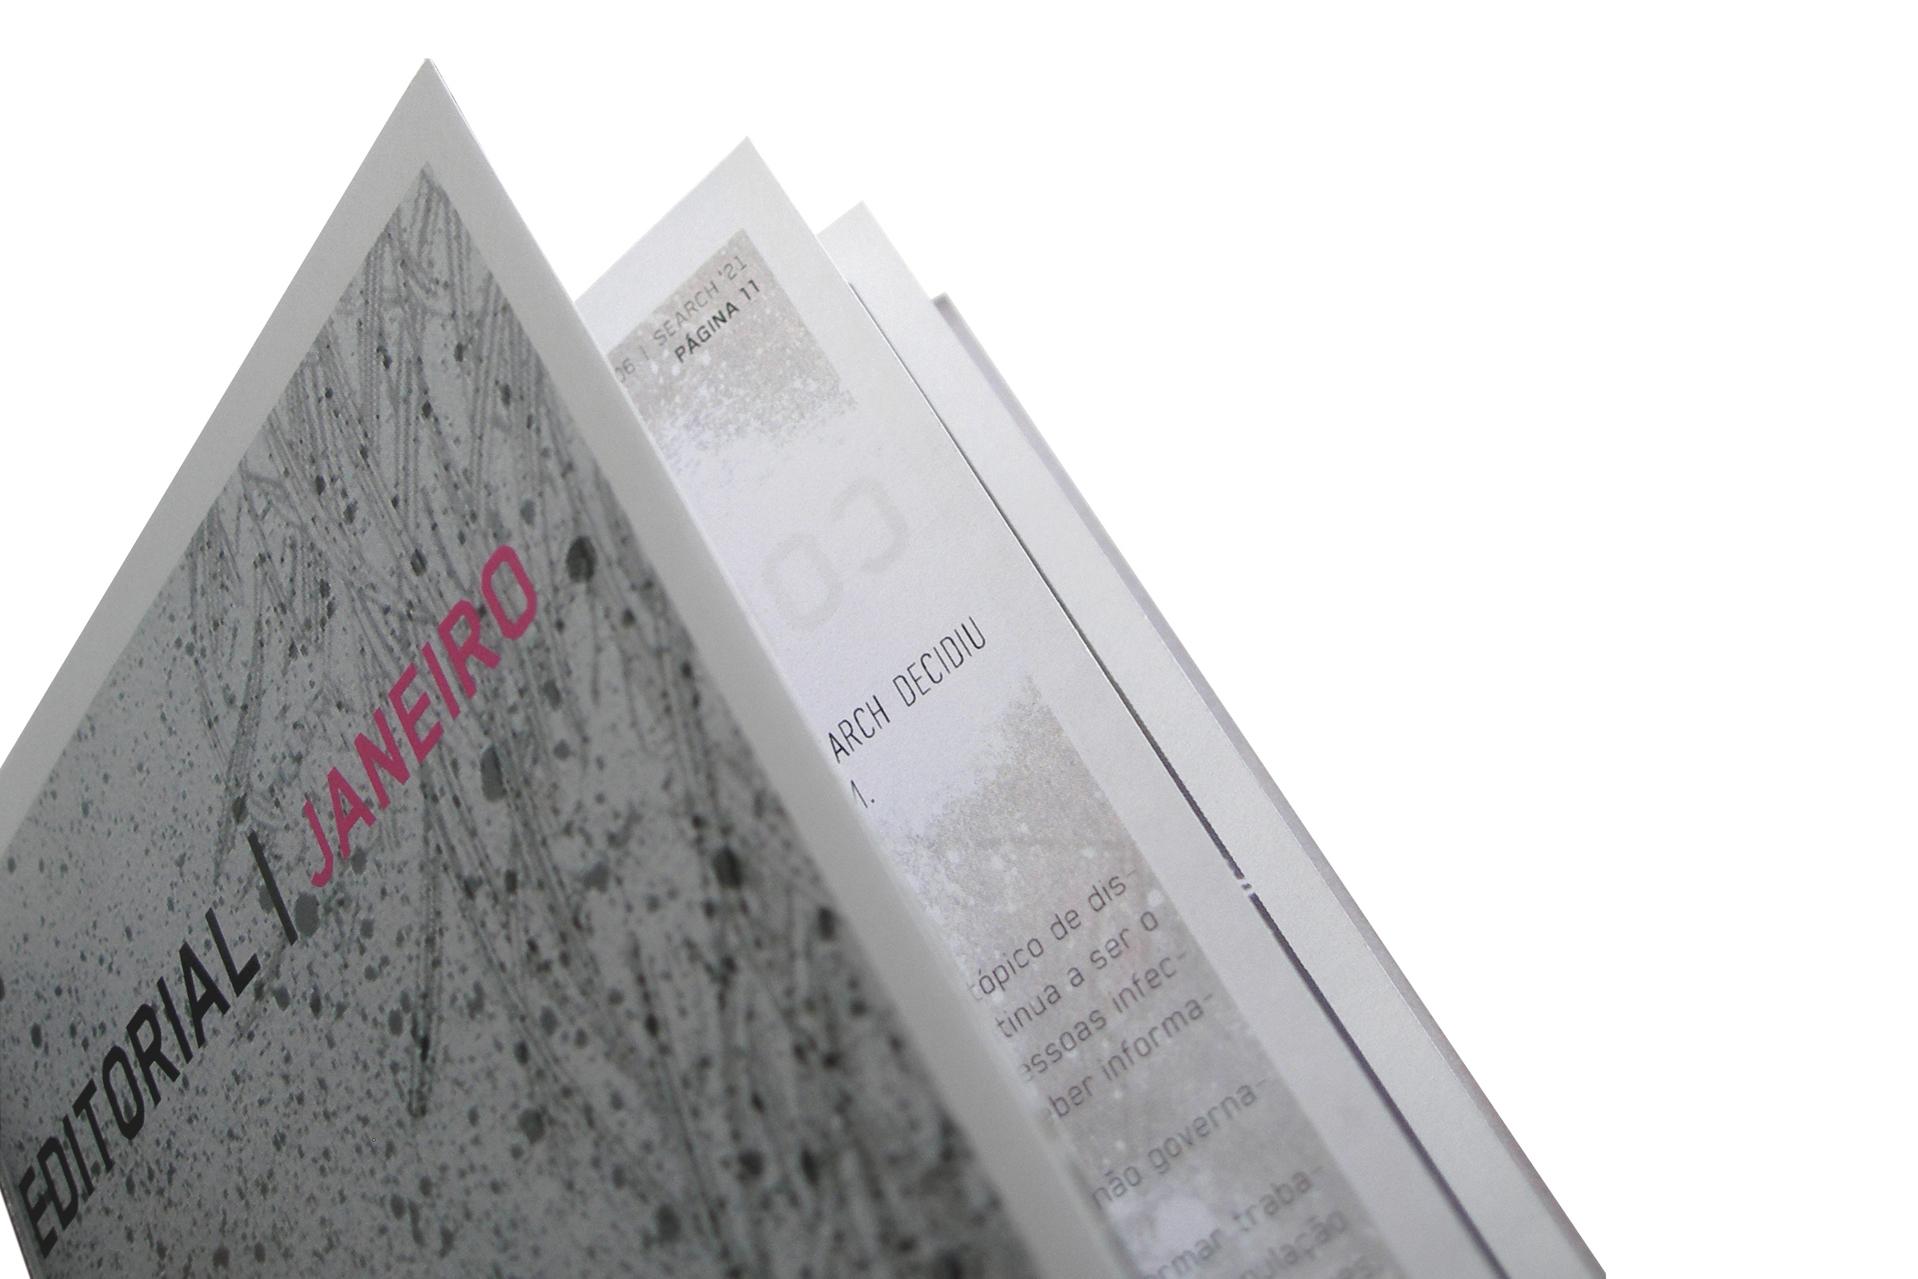 Design-Grafico-Graphic-Design-Publicacao-Editorial-Paginacao-Revista-Magazine-Search-bonjourmolotov N.jpg